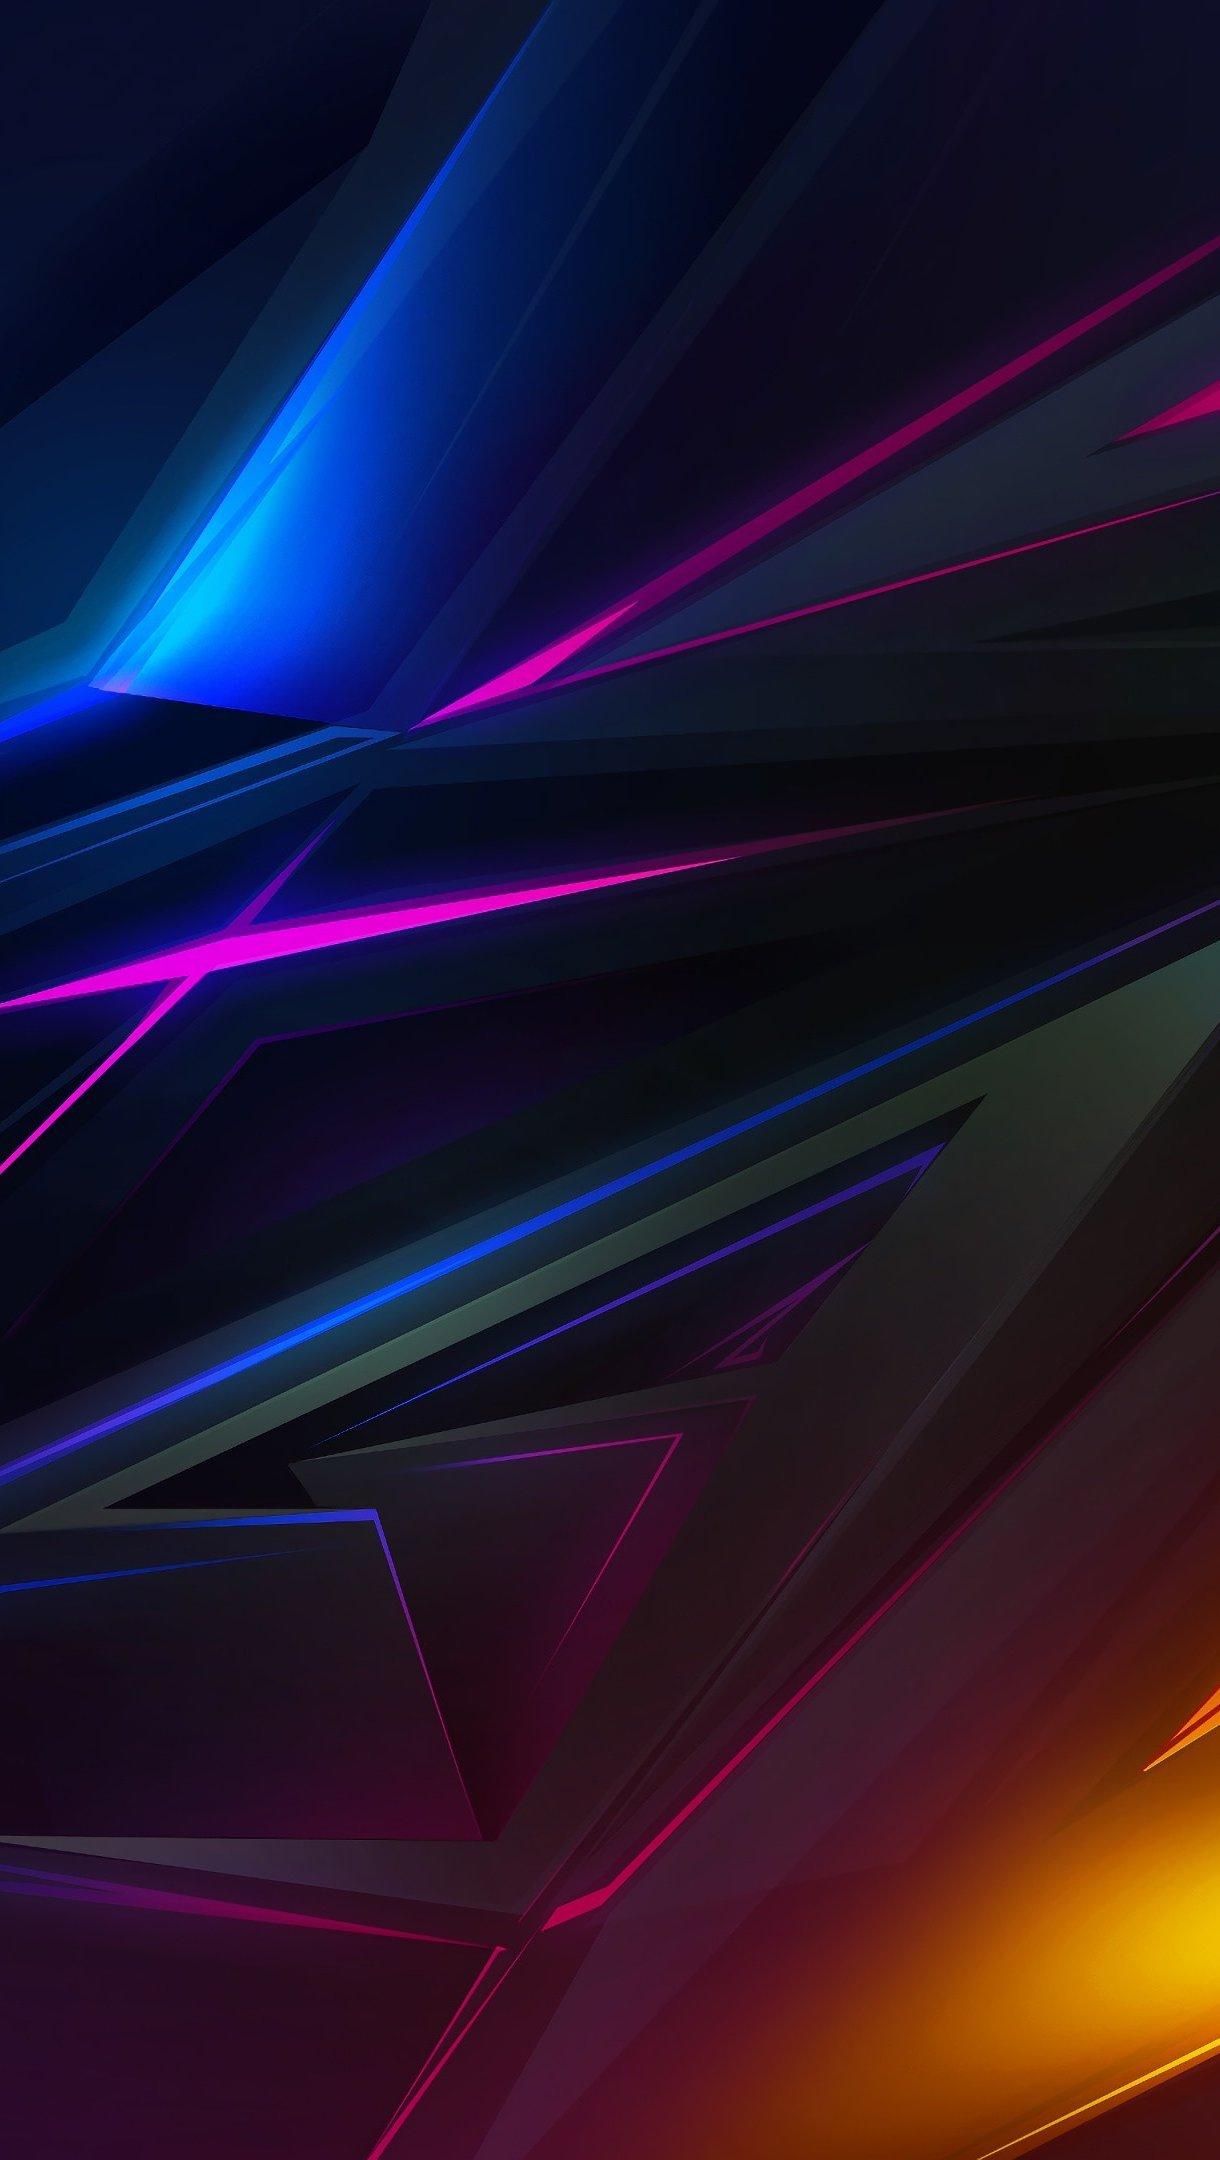 Abstract Polygons Wallpaper 4k Ultra HD ID:3089